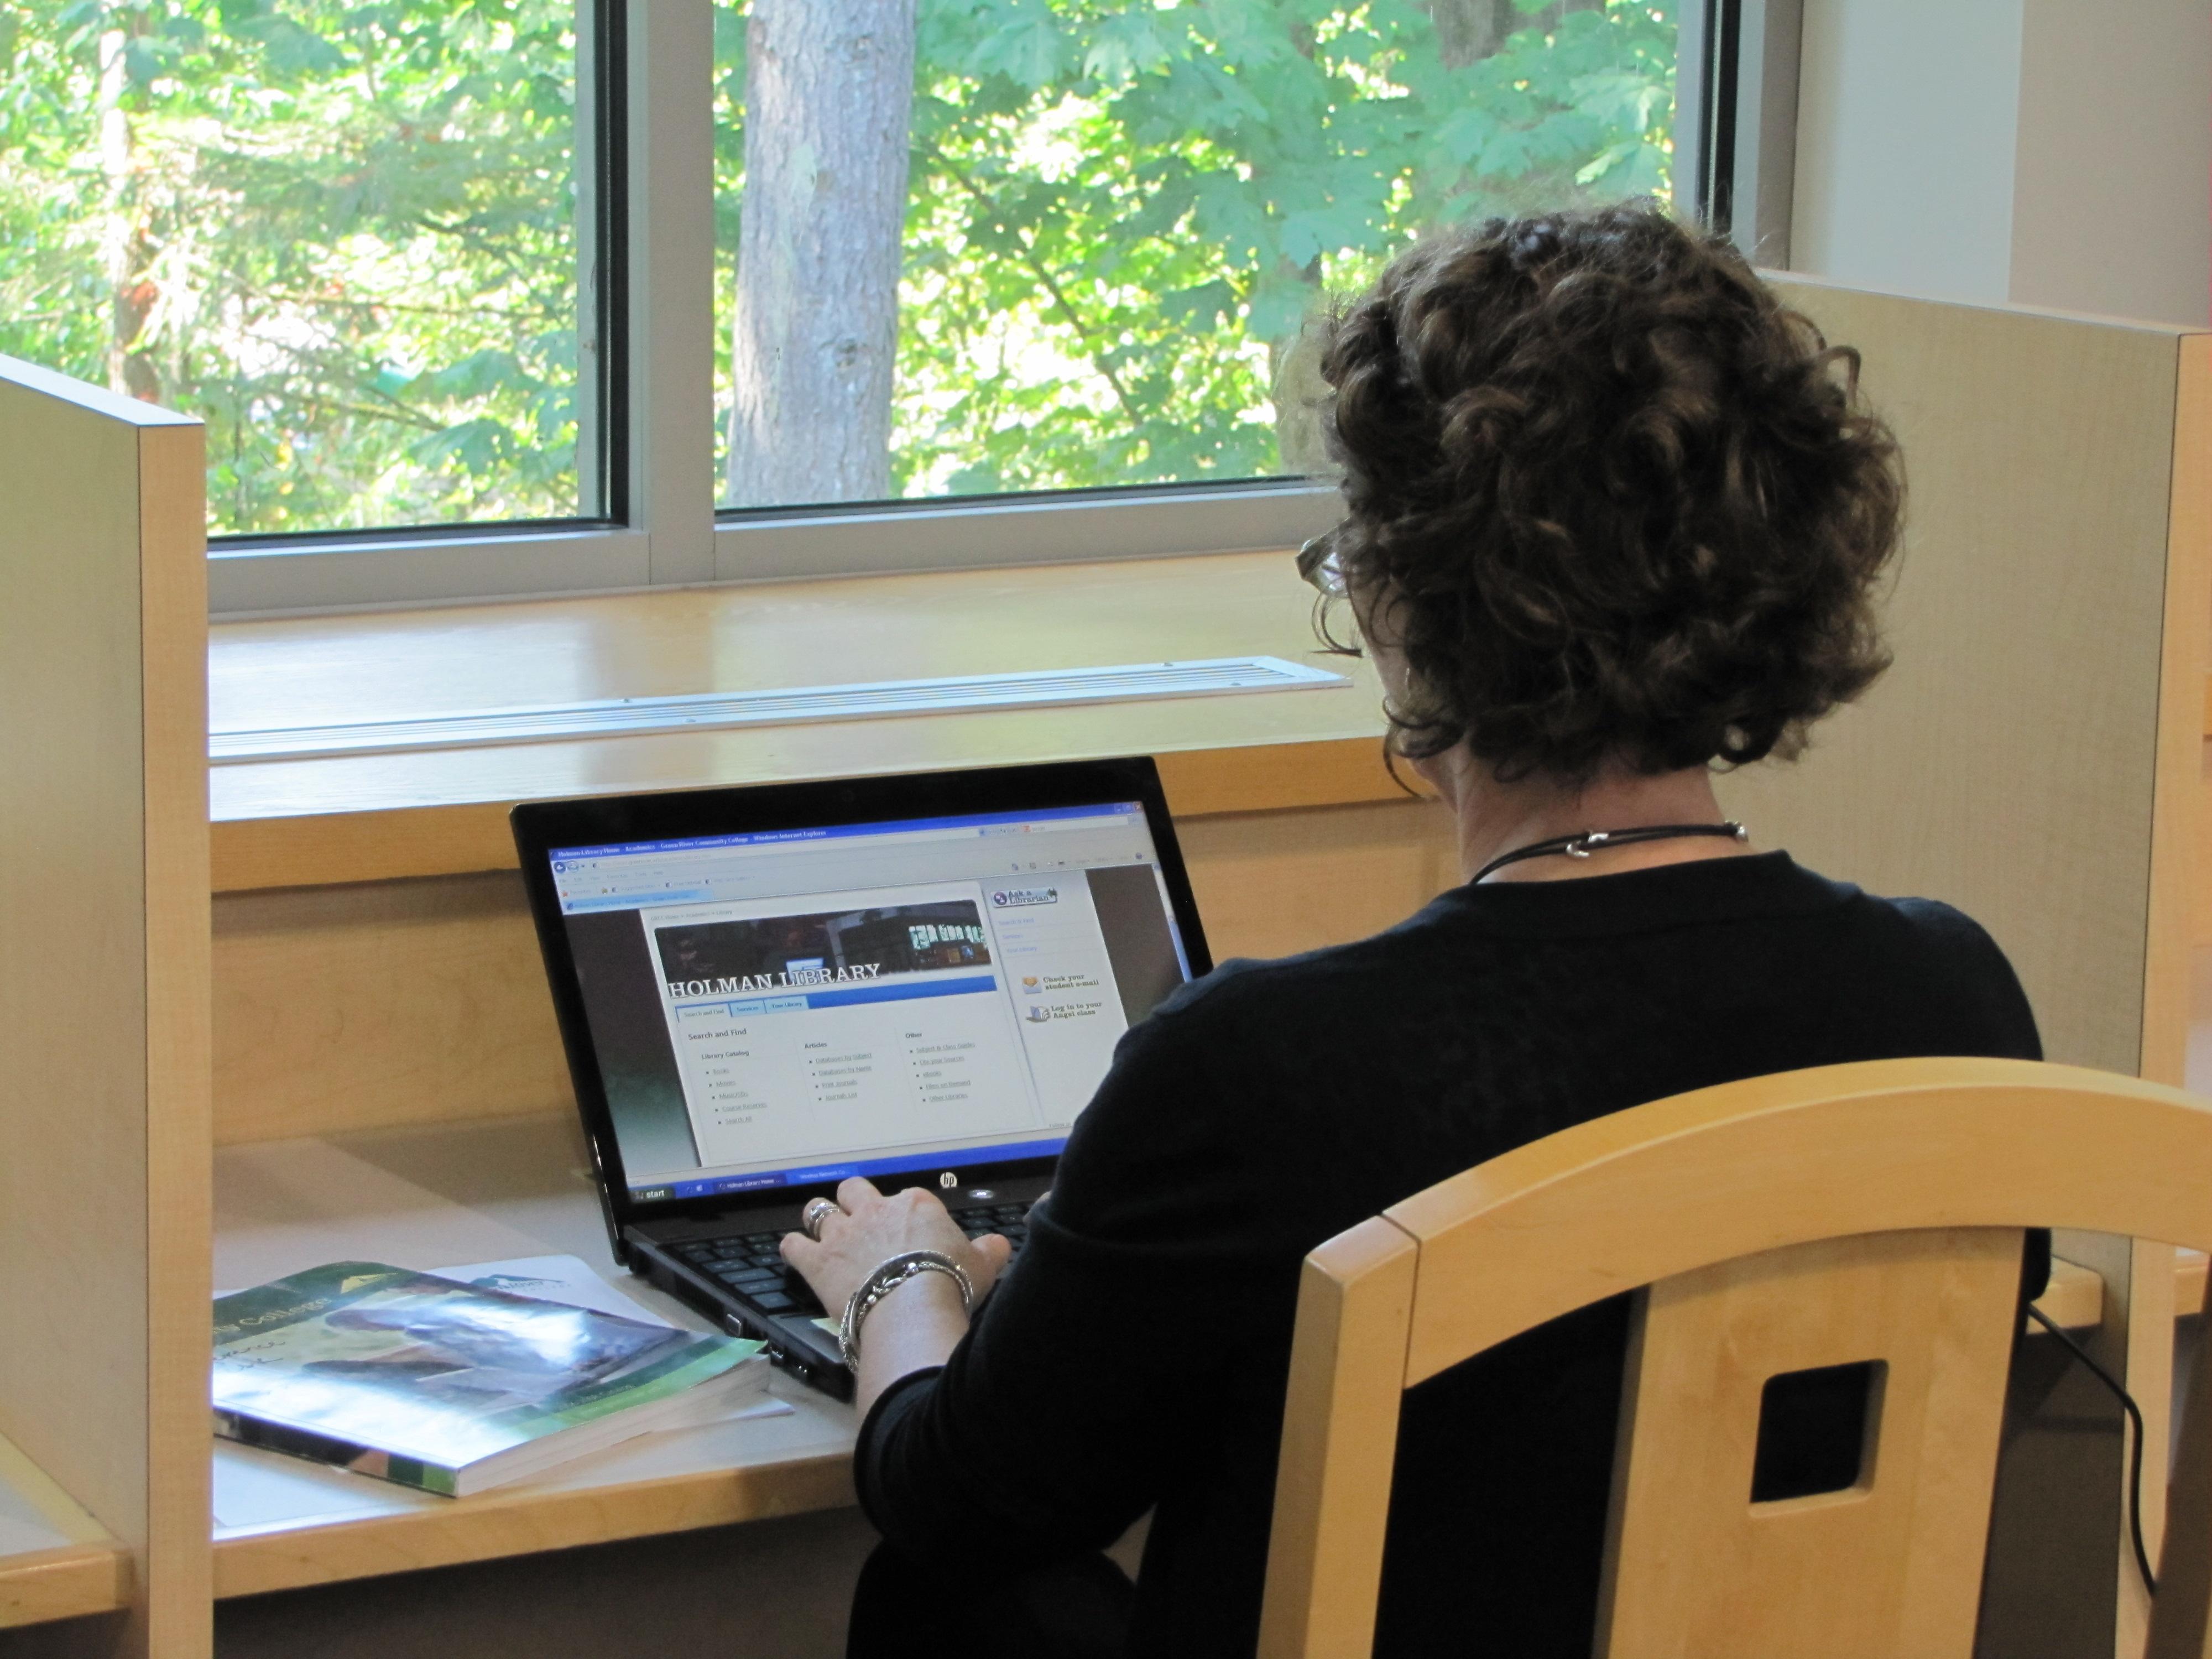 Laptop user at Holman Library